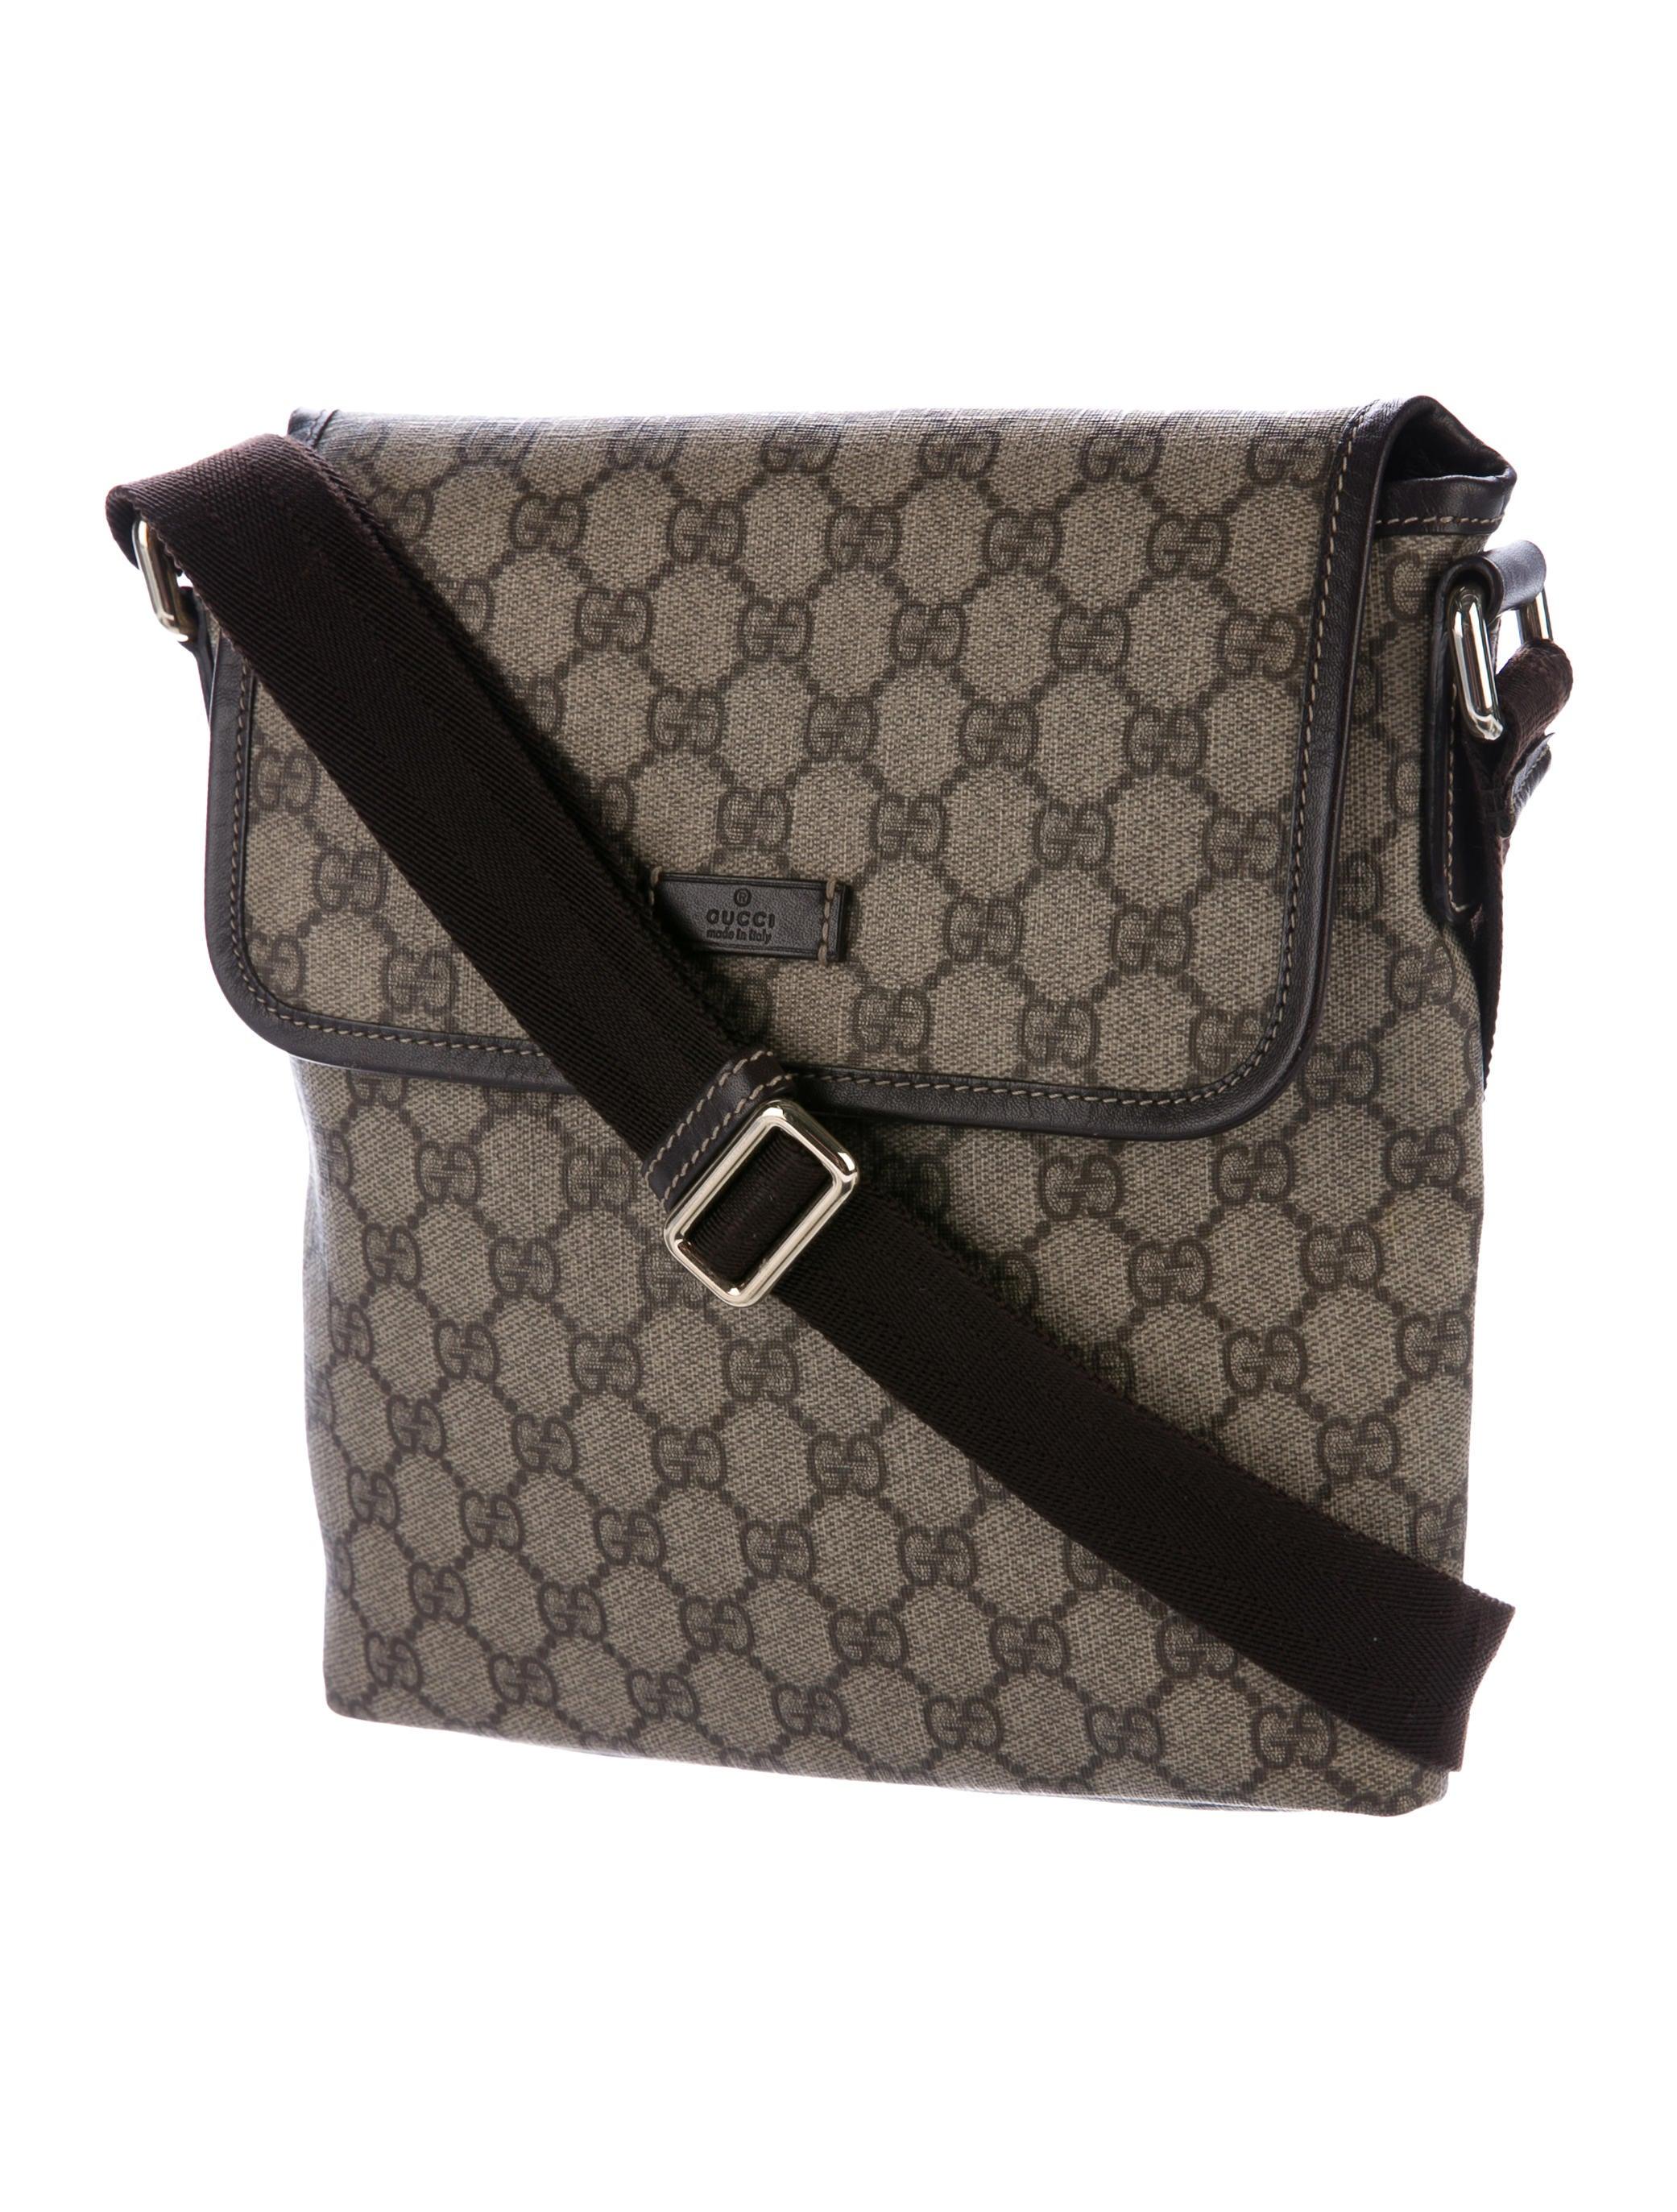 gucci gg supreme messenger bag handbags guc164404 the realreal. Black Bedroom Furniture Sets. Home Design Ideas